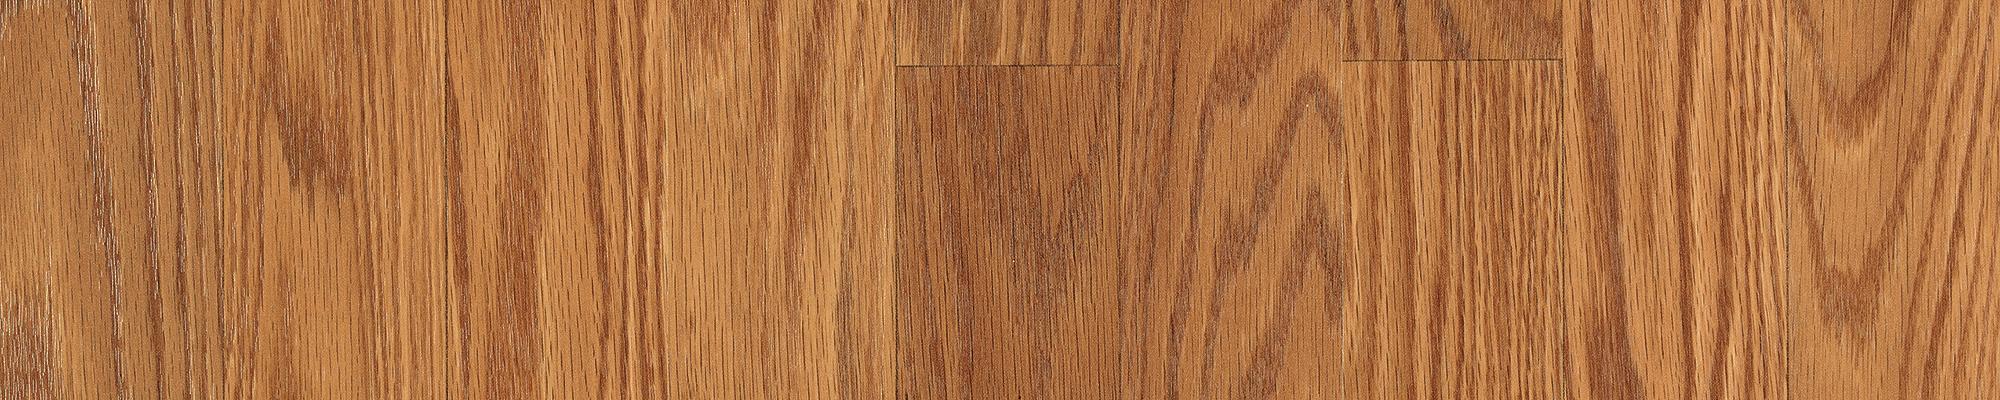 Carrolton Natural Teak Plank Laminate Wood Flooring